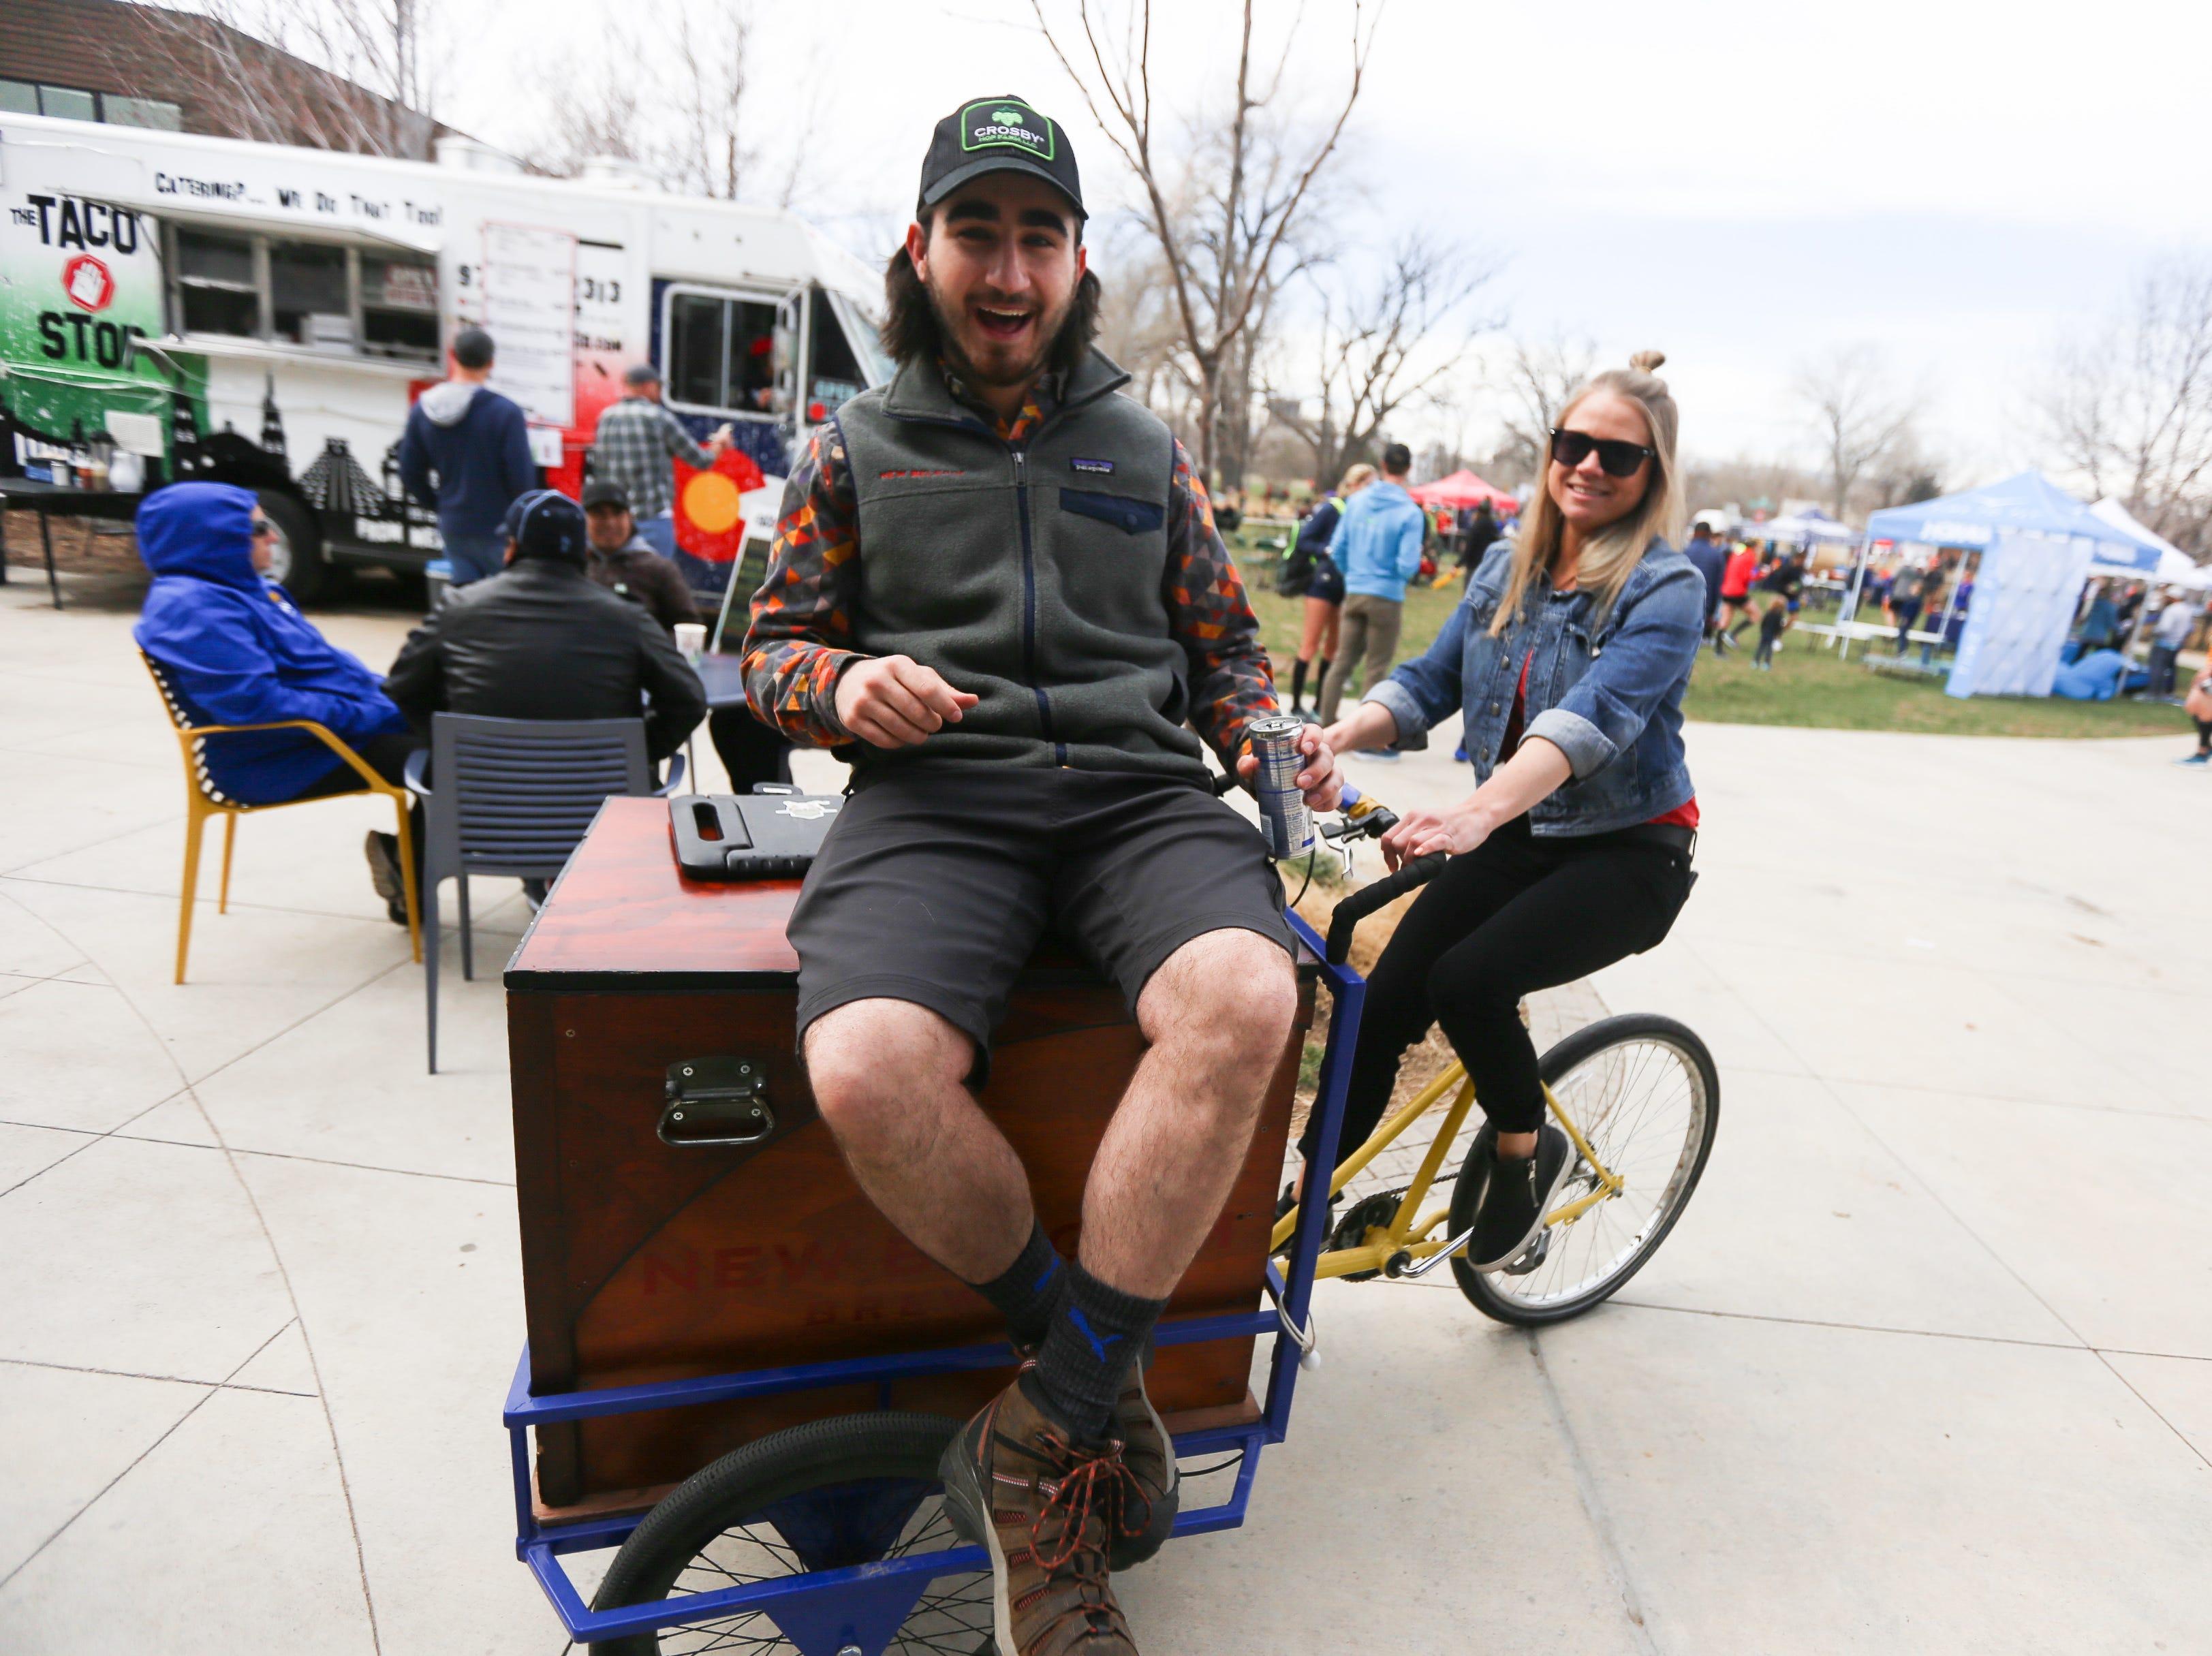 A man rides ontop of a New Belgium cart during the Horsetooth Half Marathon afterparty.